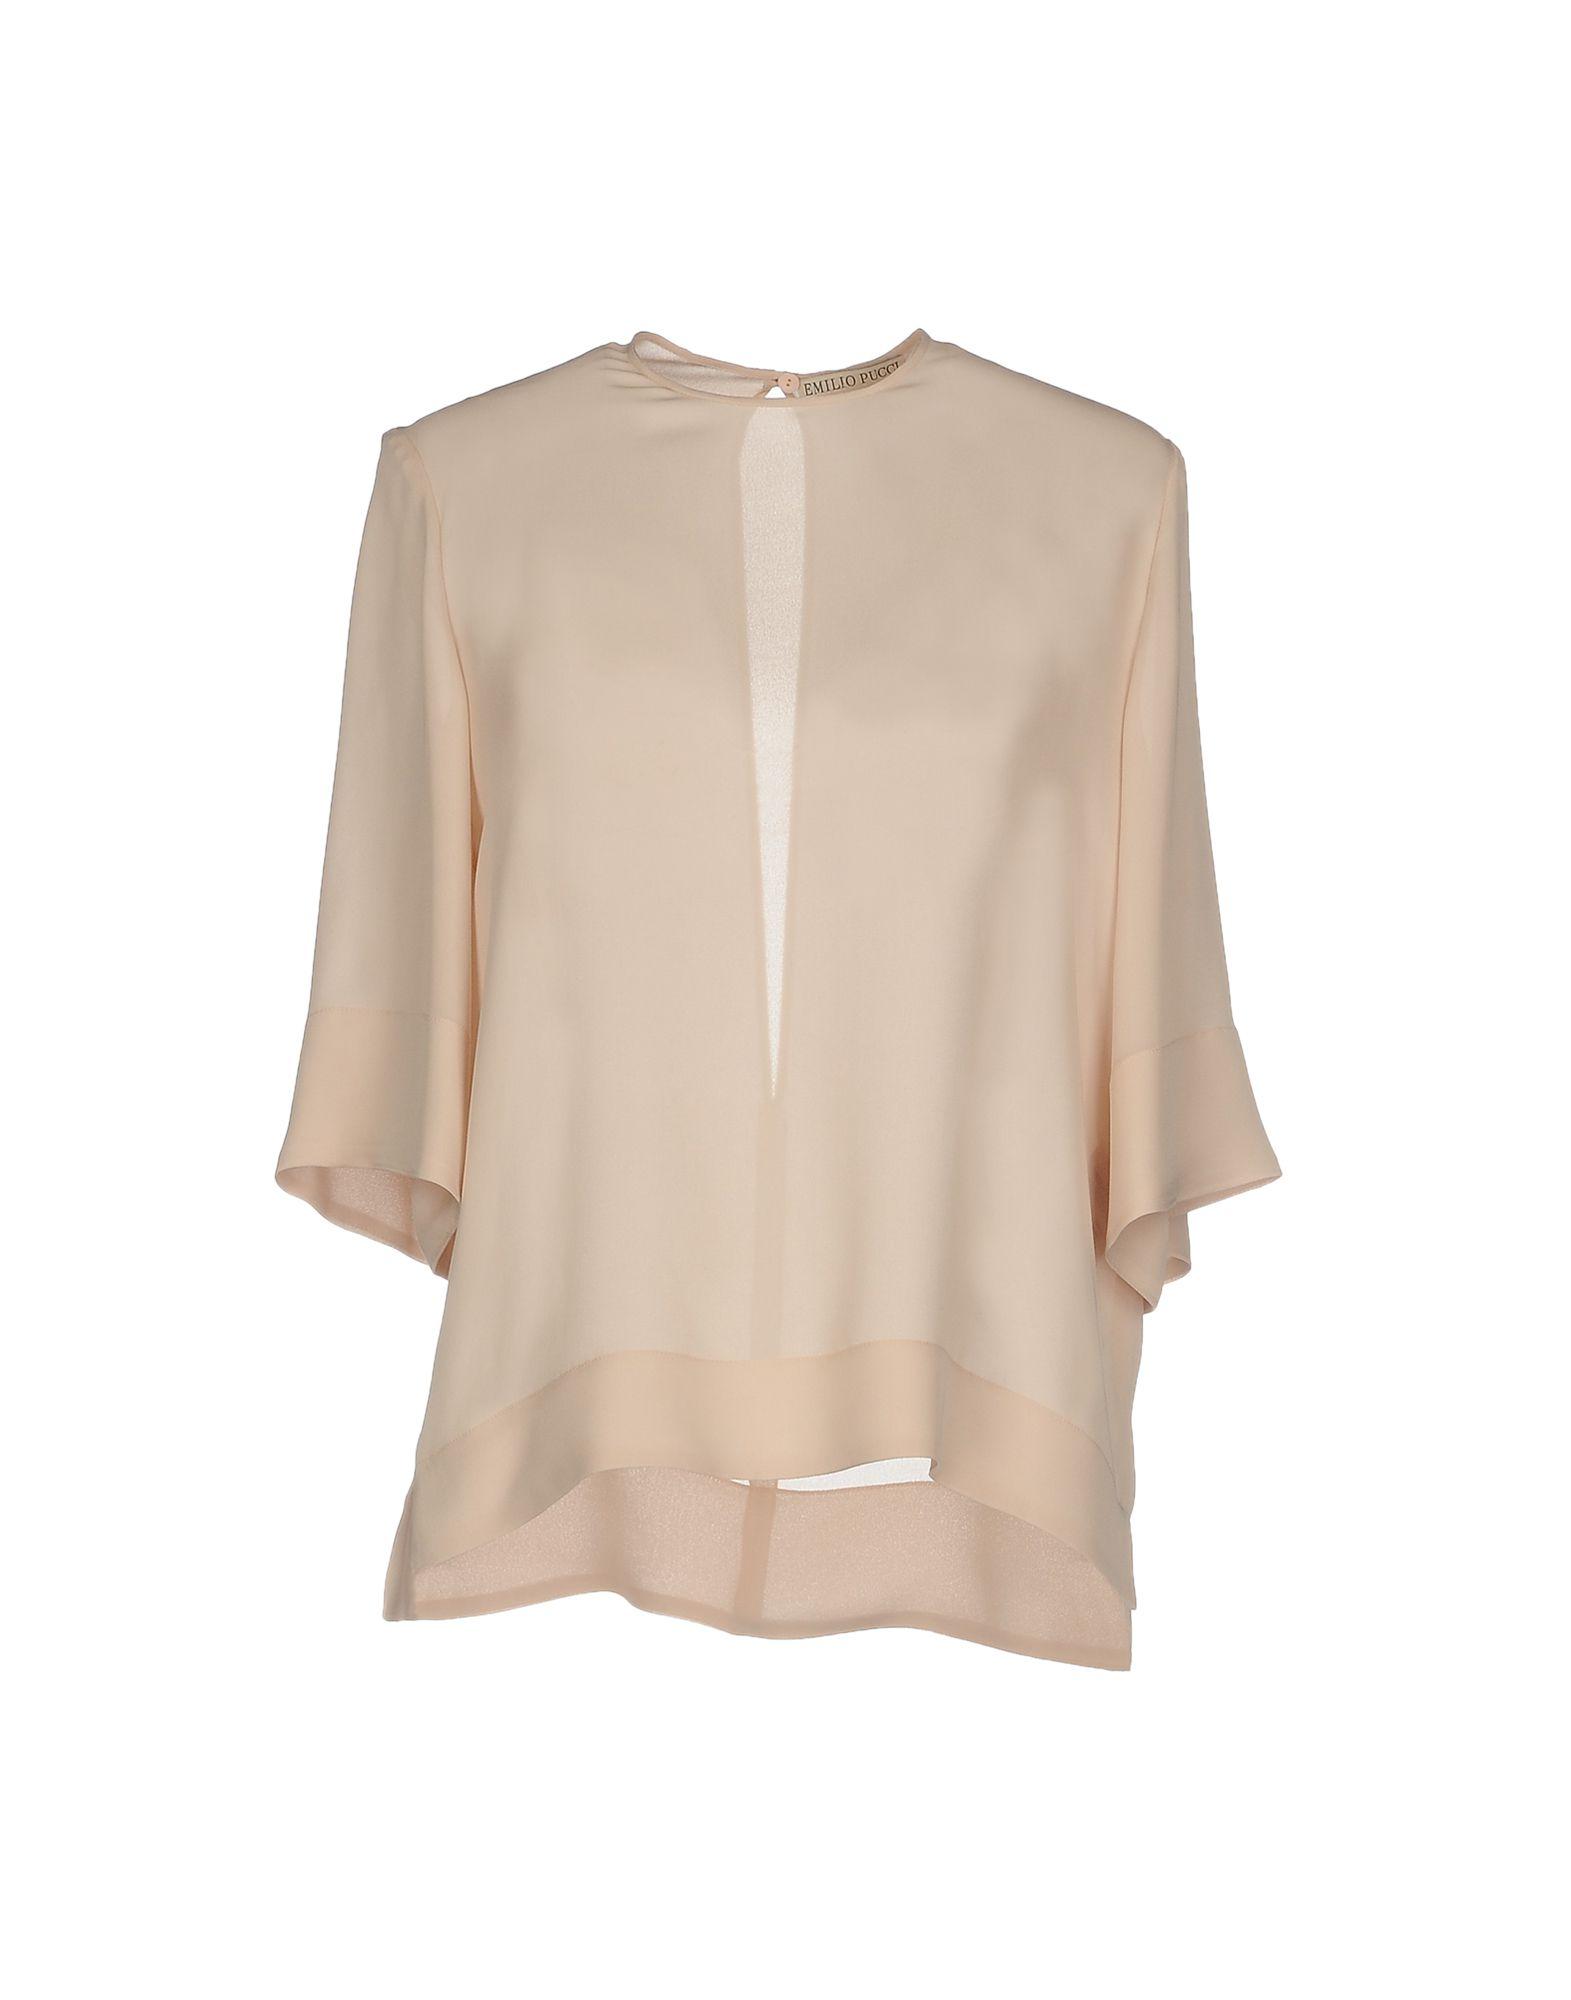 EMILIO PUCCI Блузка блузка с рисунком короткие рукава вырез сзади